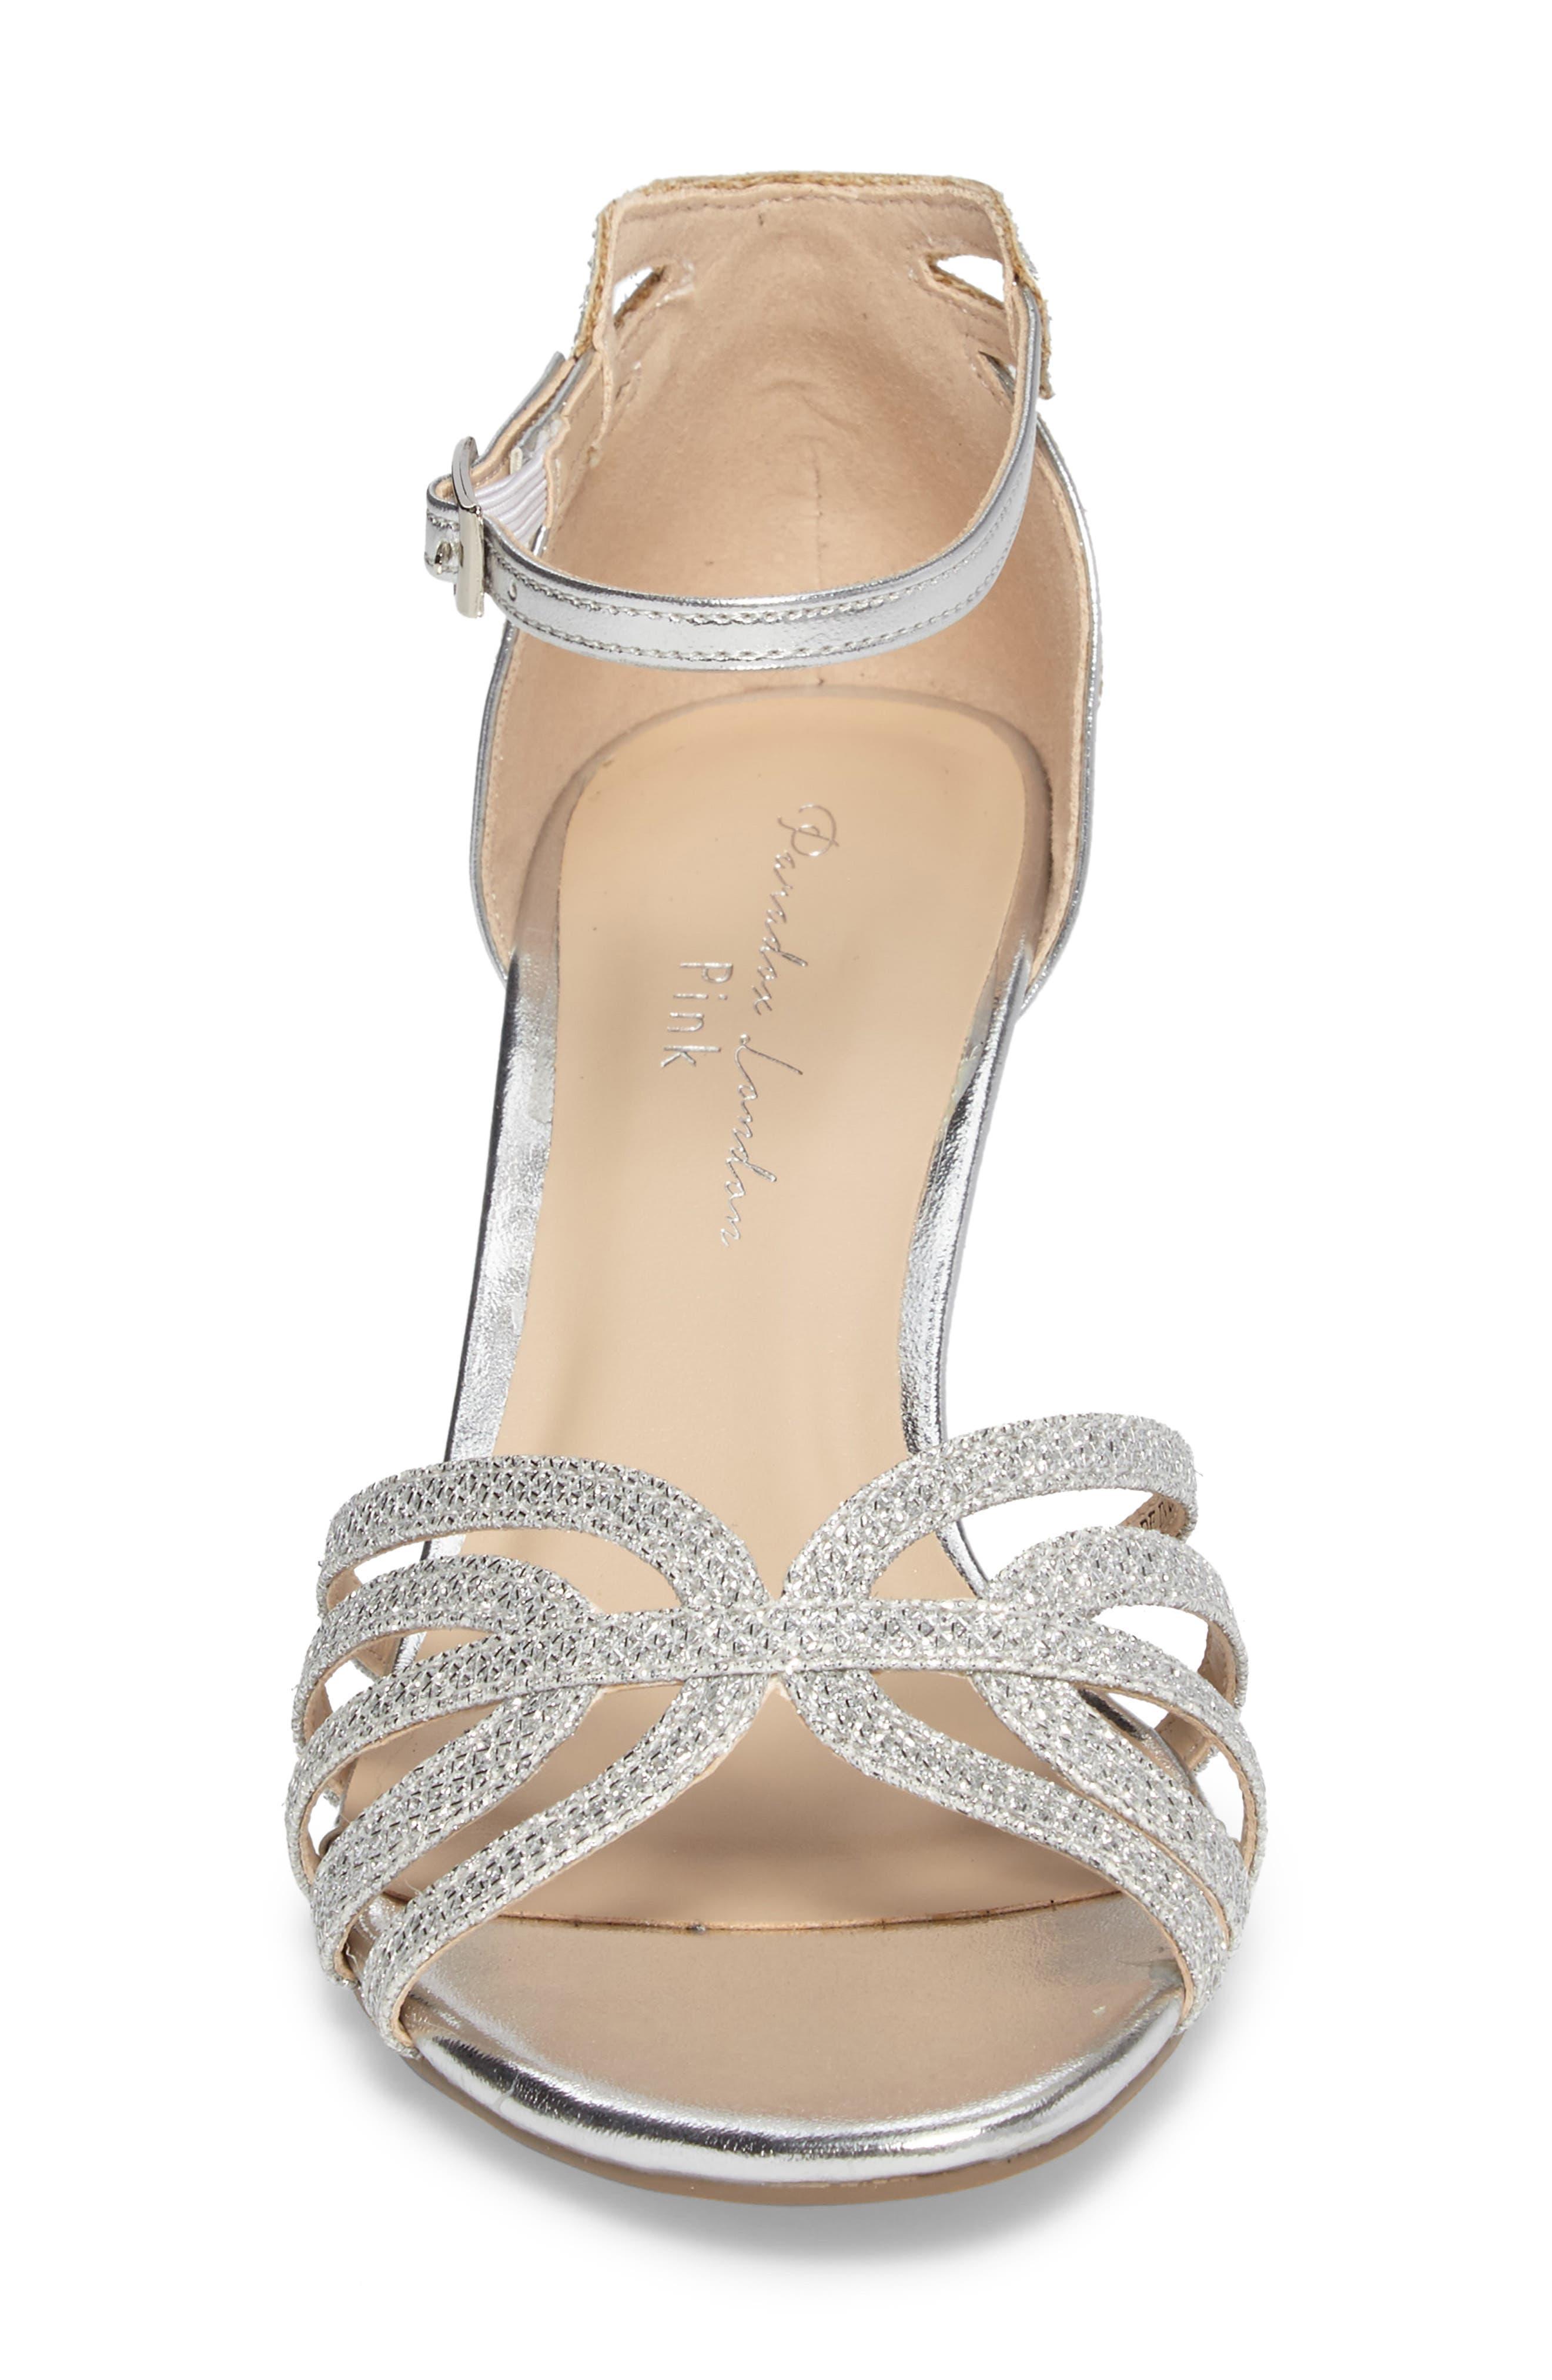 Melby Ankle Strap Sandal,                             Alternate thumbnail 4, color,                             SILVER